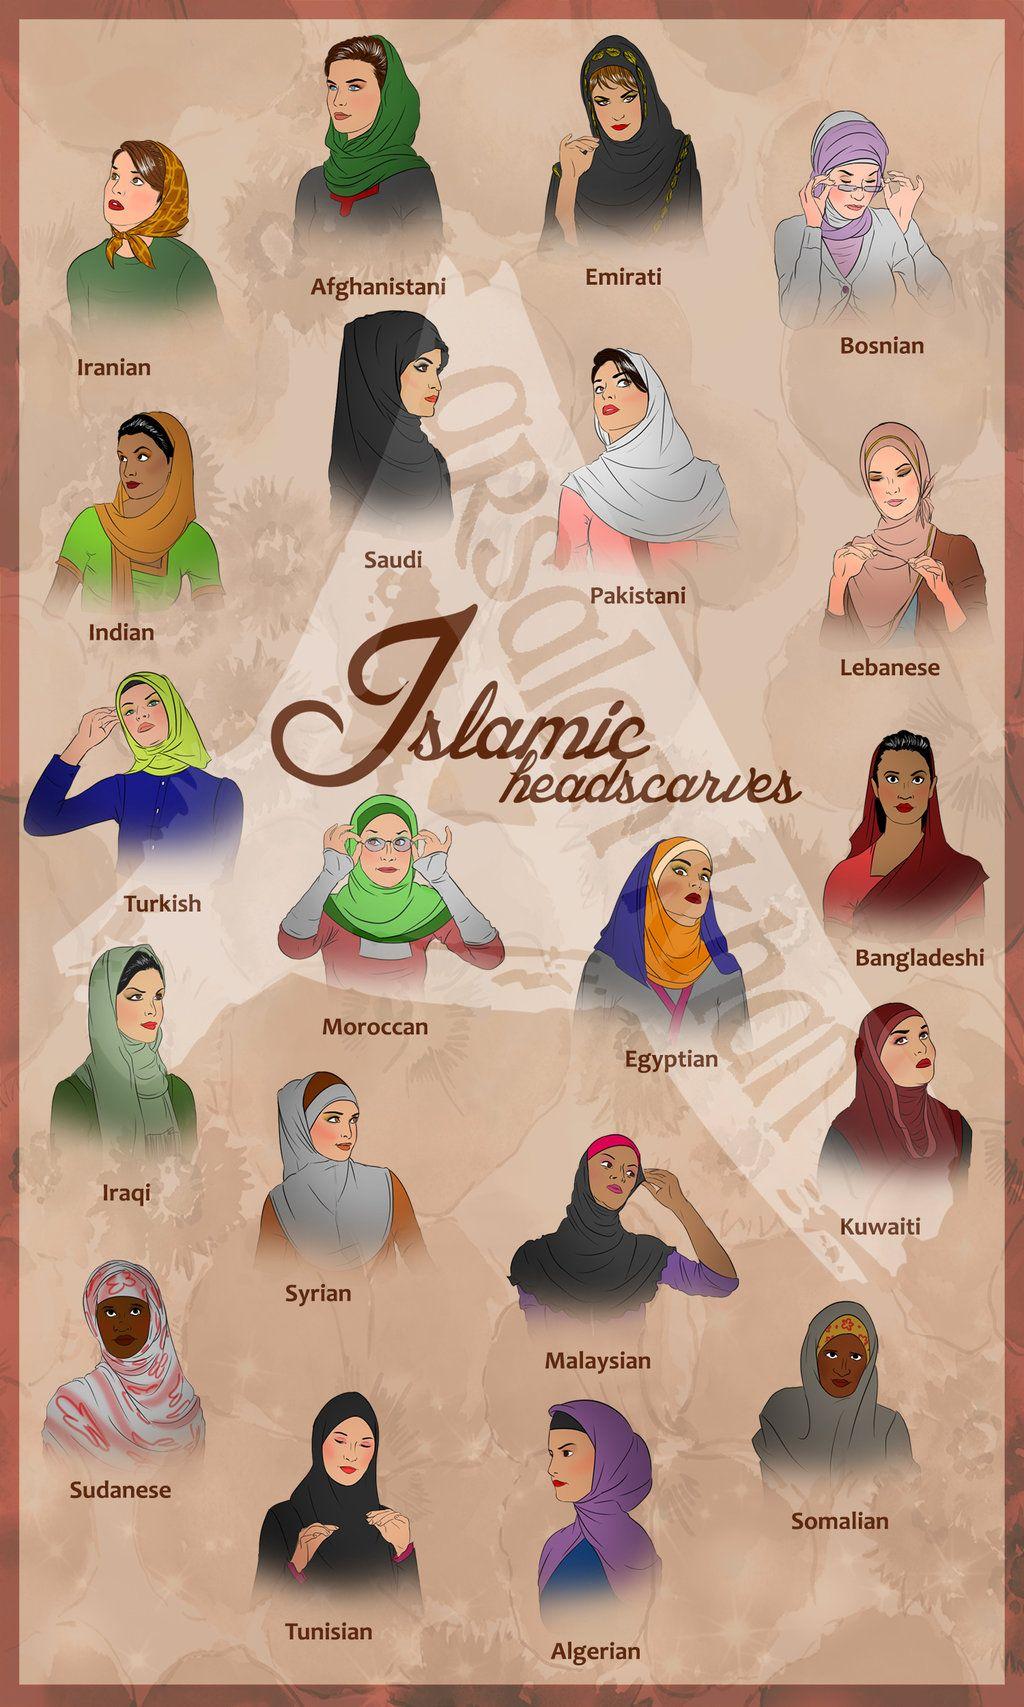 Islamic Headscaves by ArsalanKhanArtist on DeviantArt